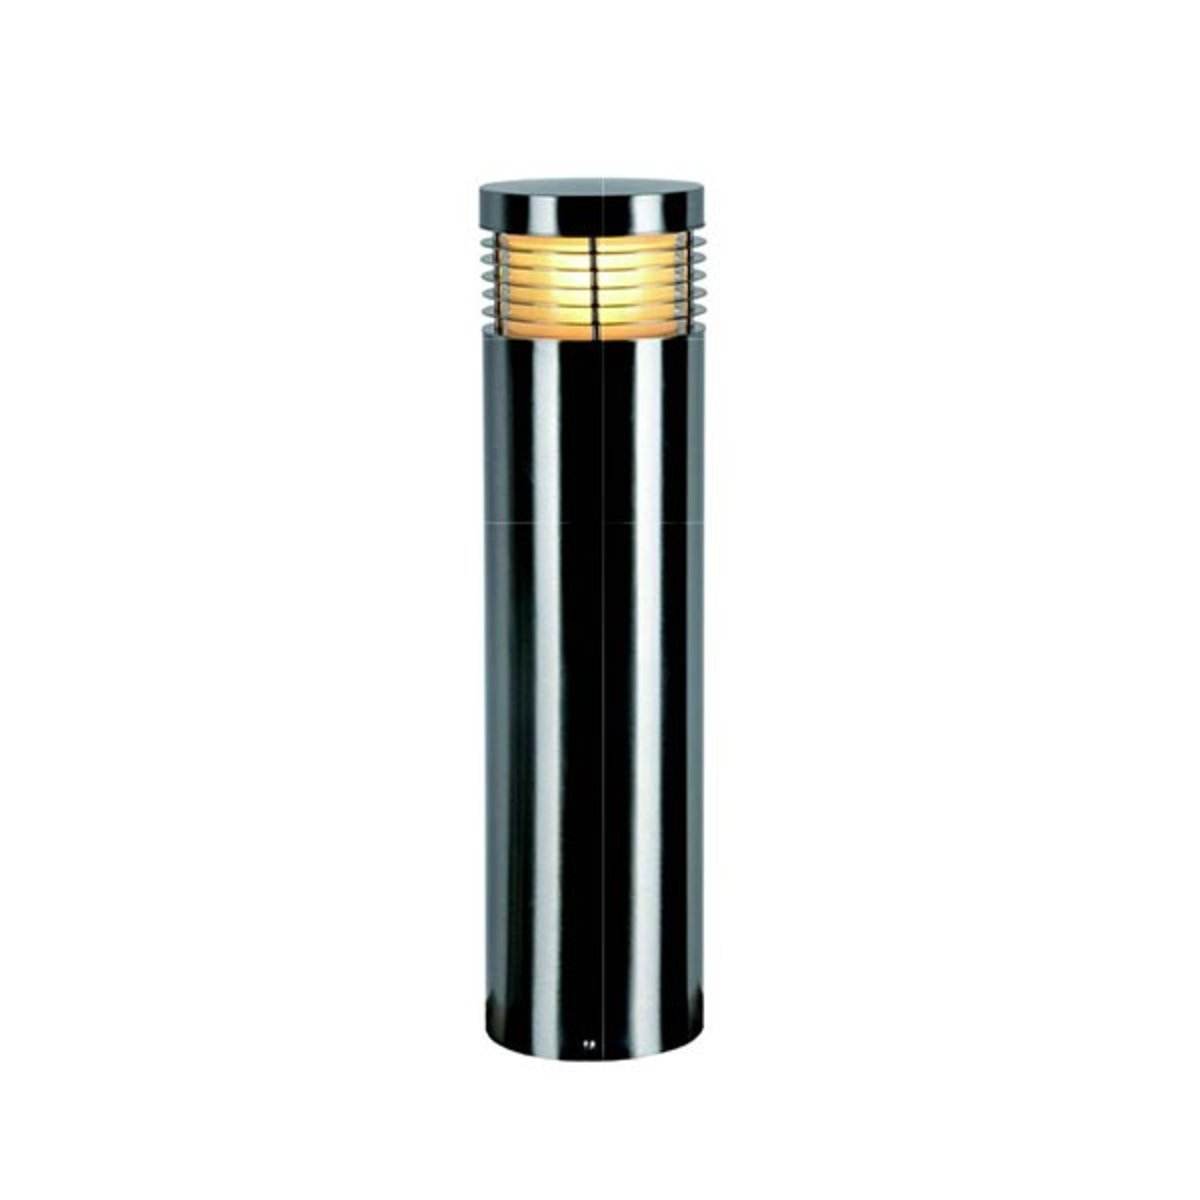 Stainless Steel Bollard - Bullard Bollards Lighting (2)